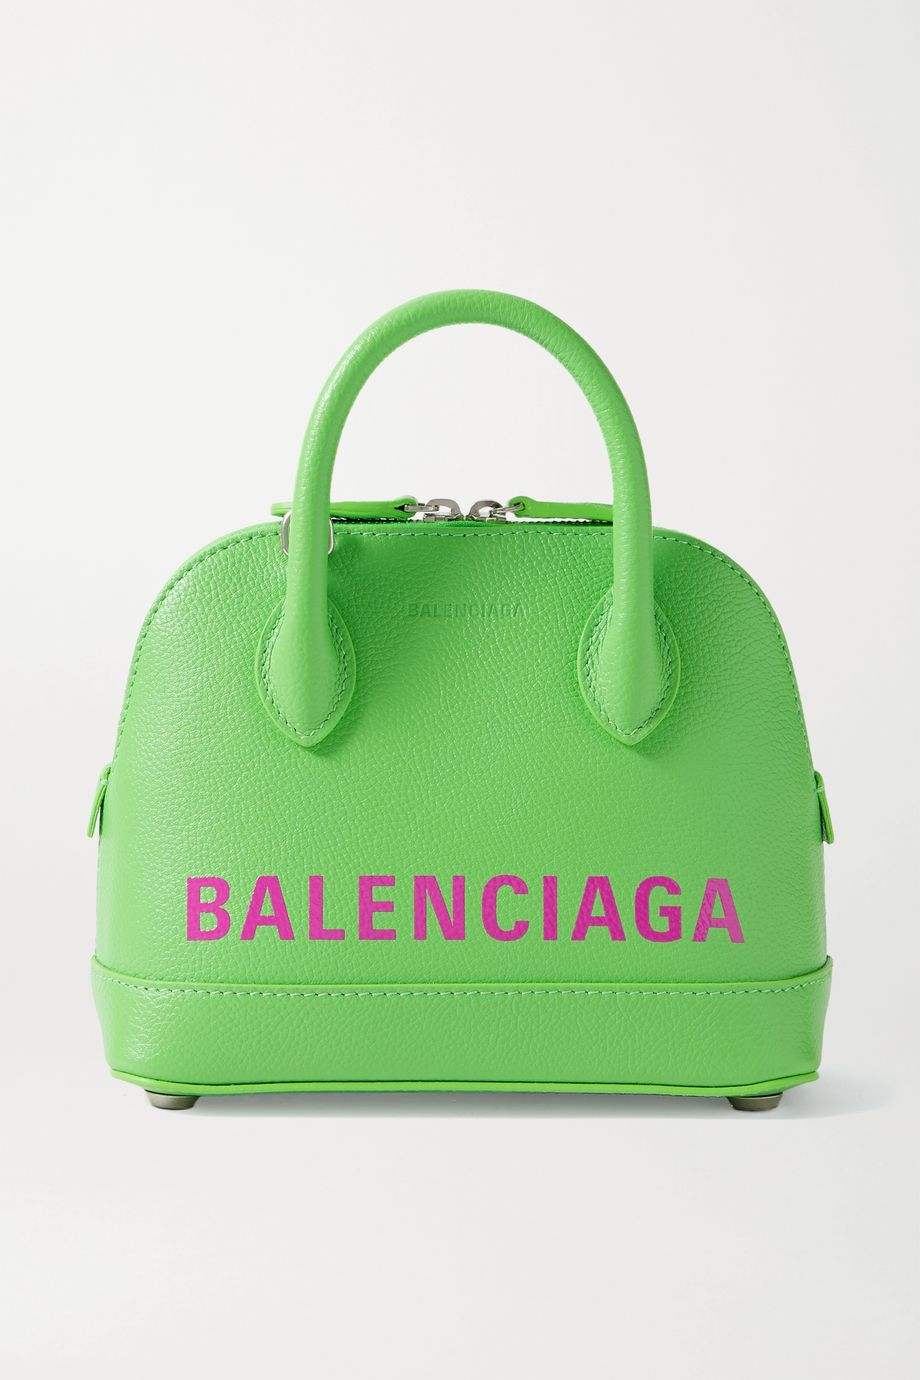 Balenciaga Ville XXS Tote aus strukturiertem Leder mit Print